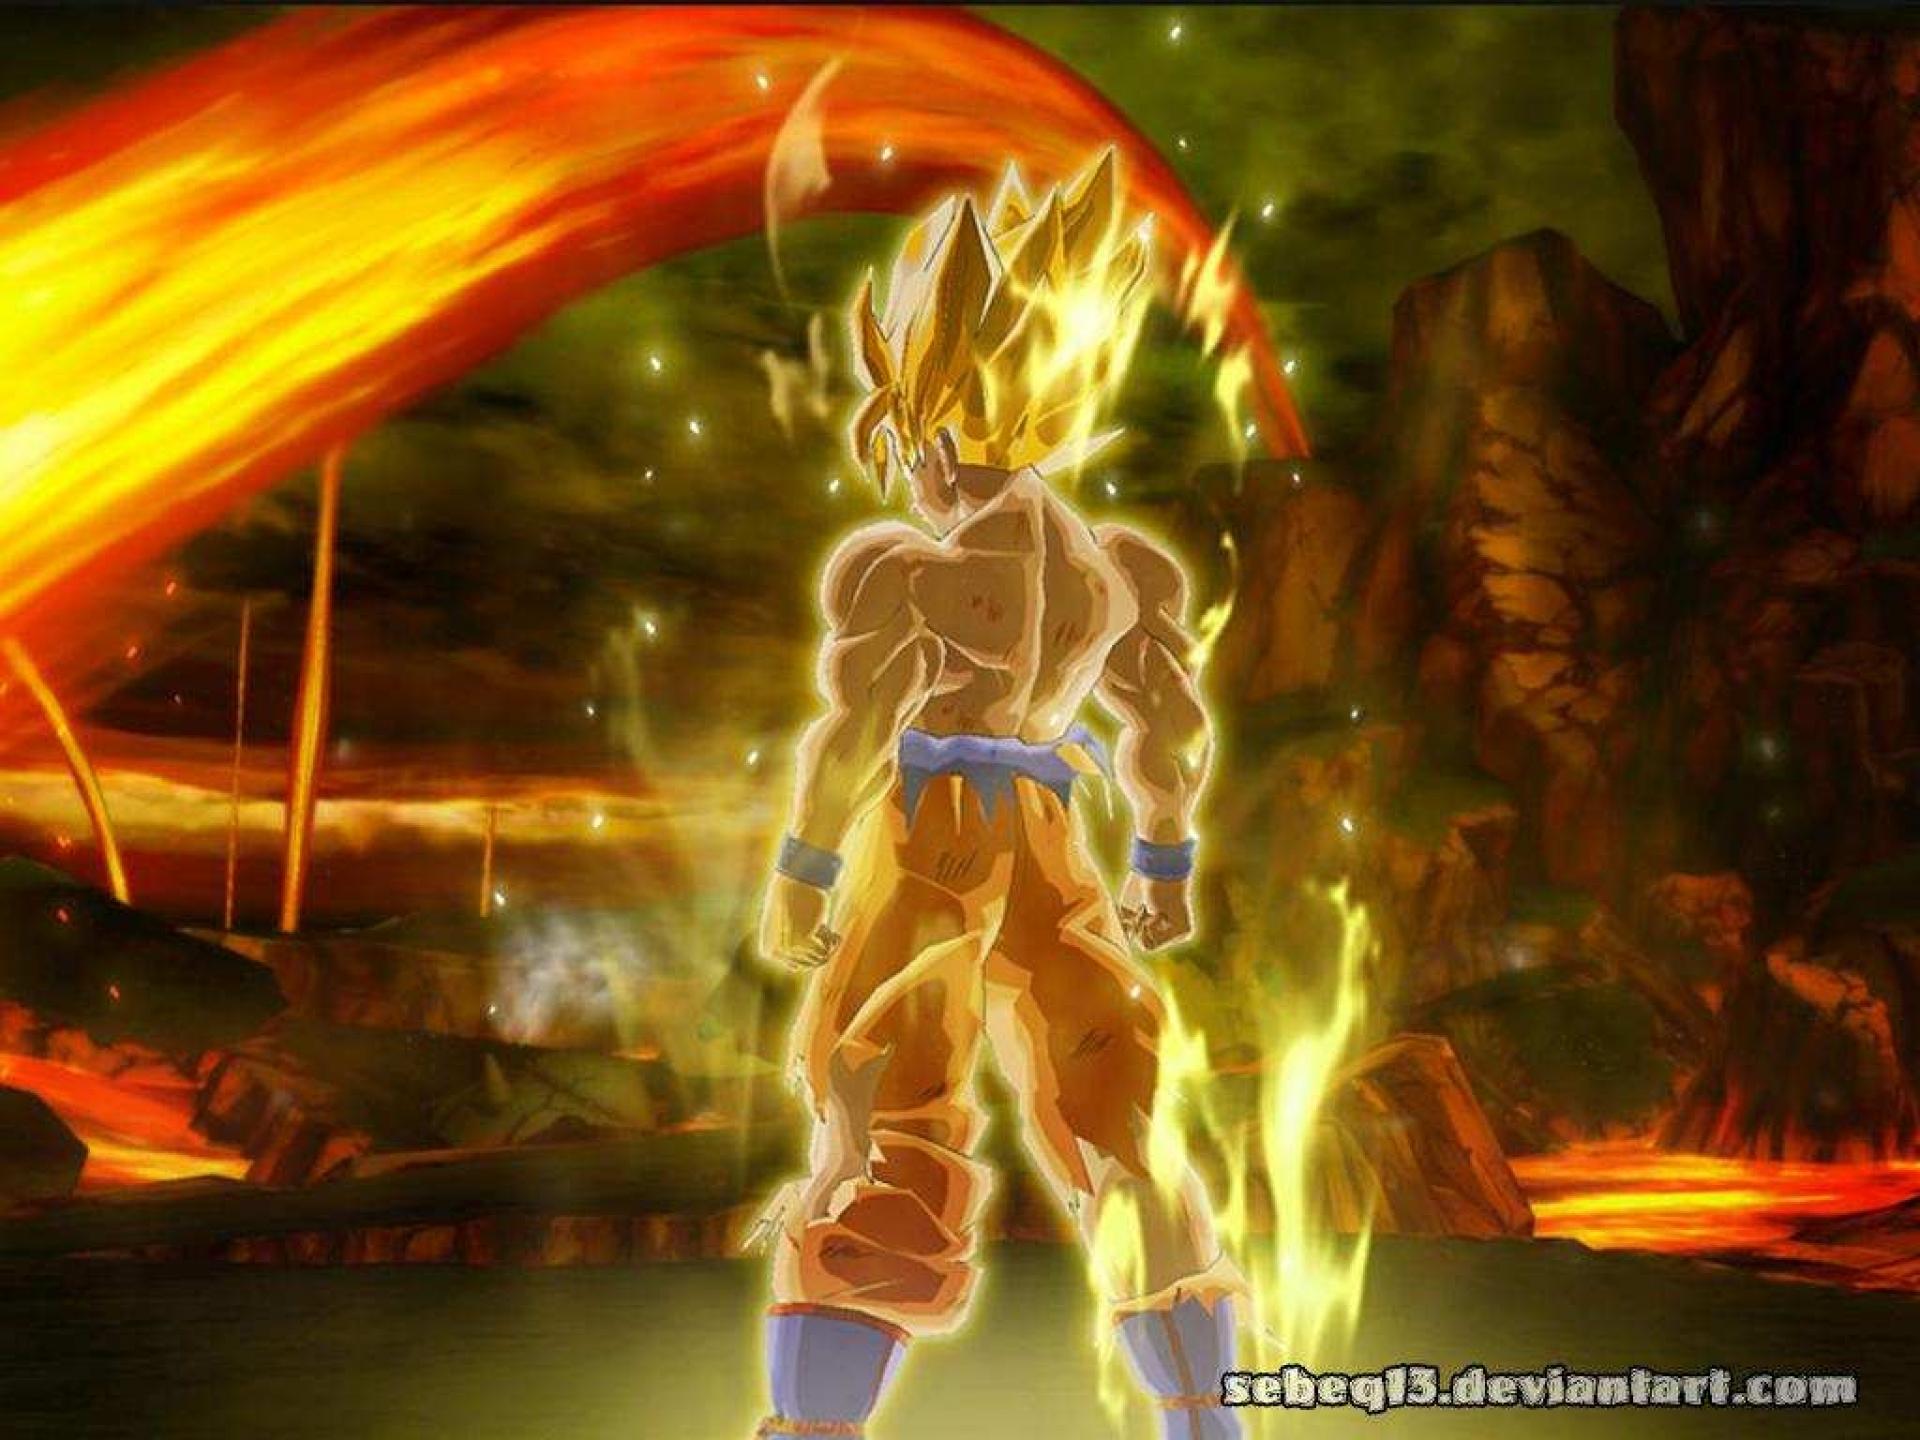 Dragon Ball Z Hd Wallpaper For Android: Dragon Ball Z Goku Wallpapers High Quality